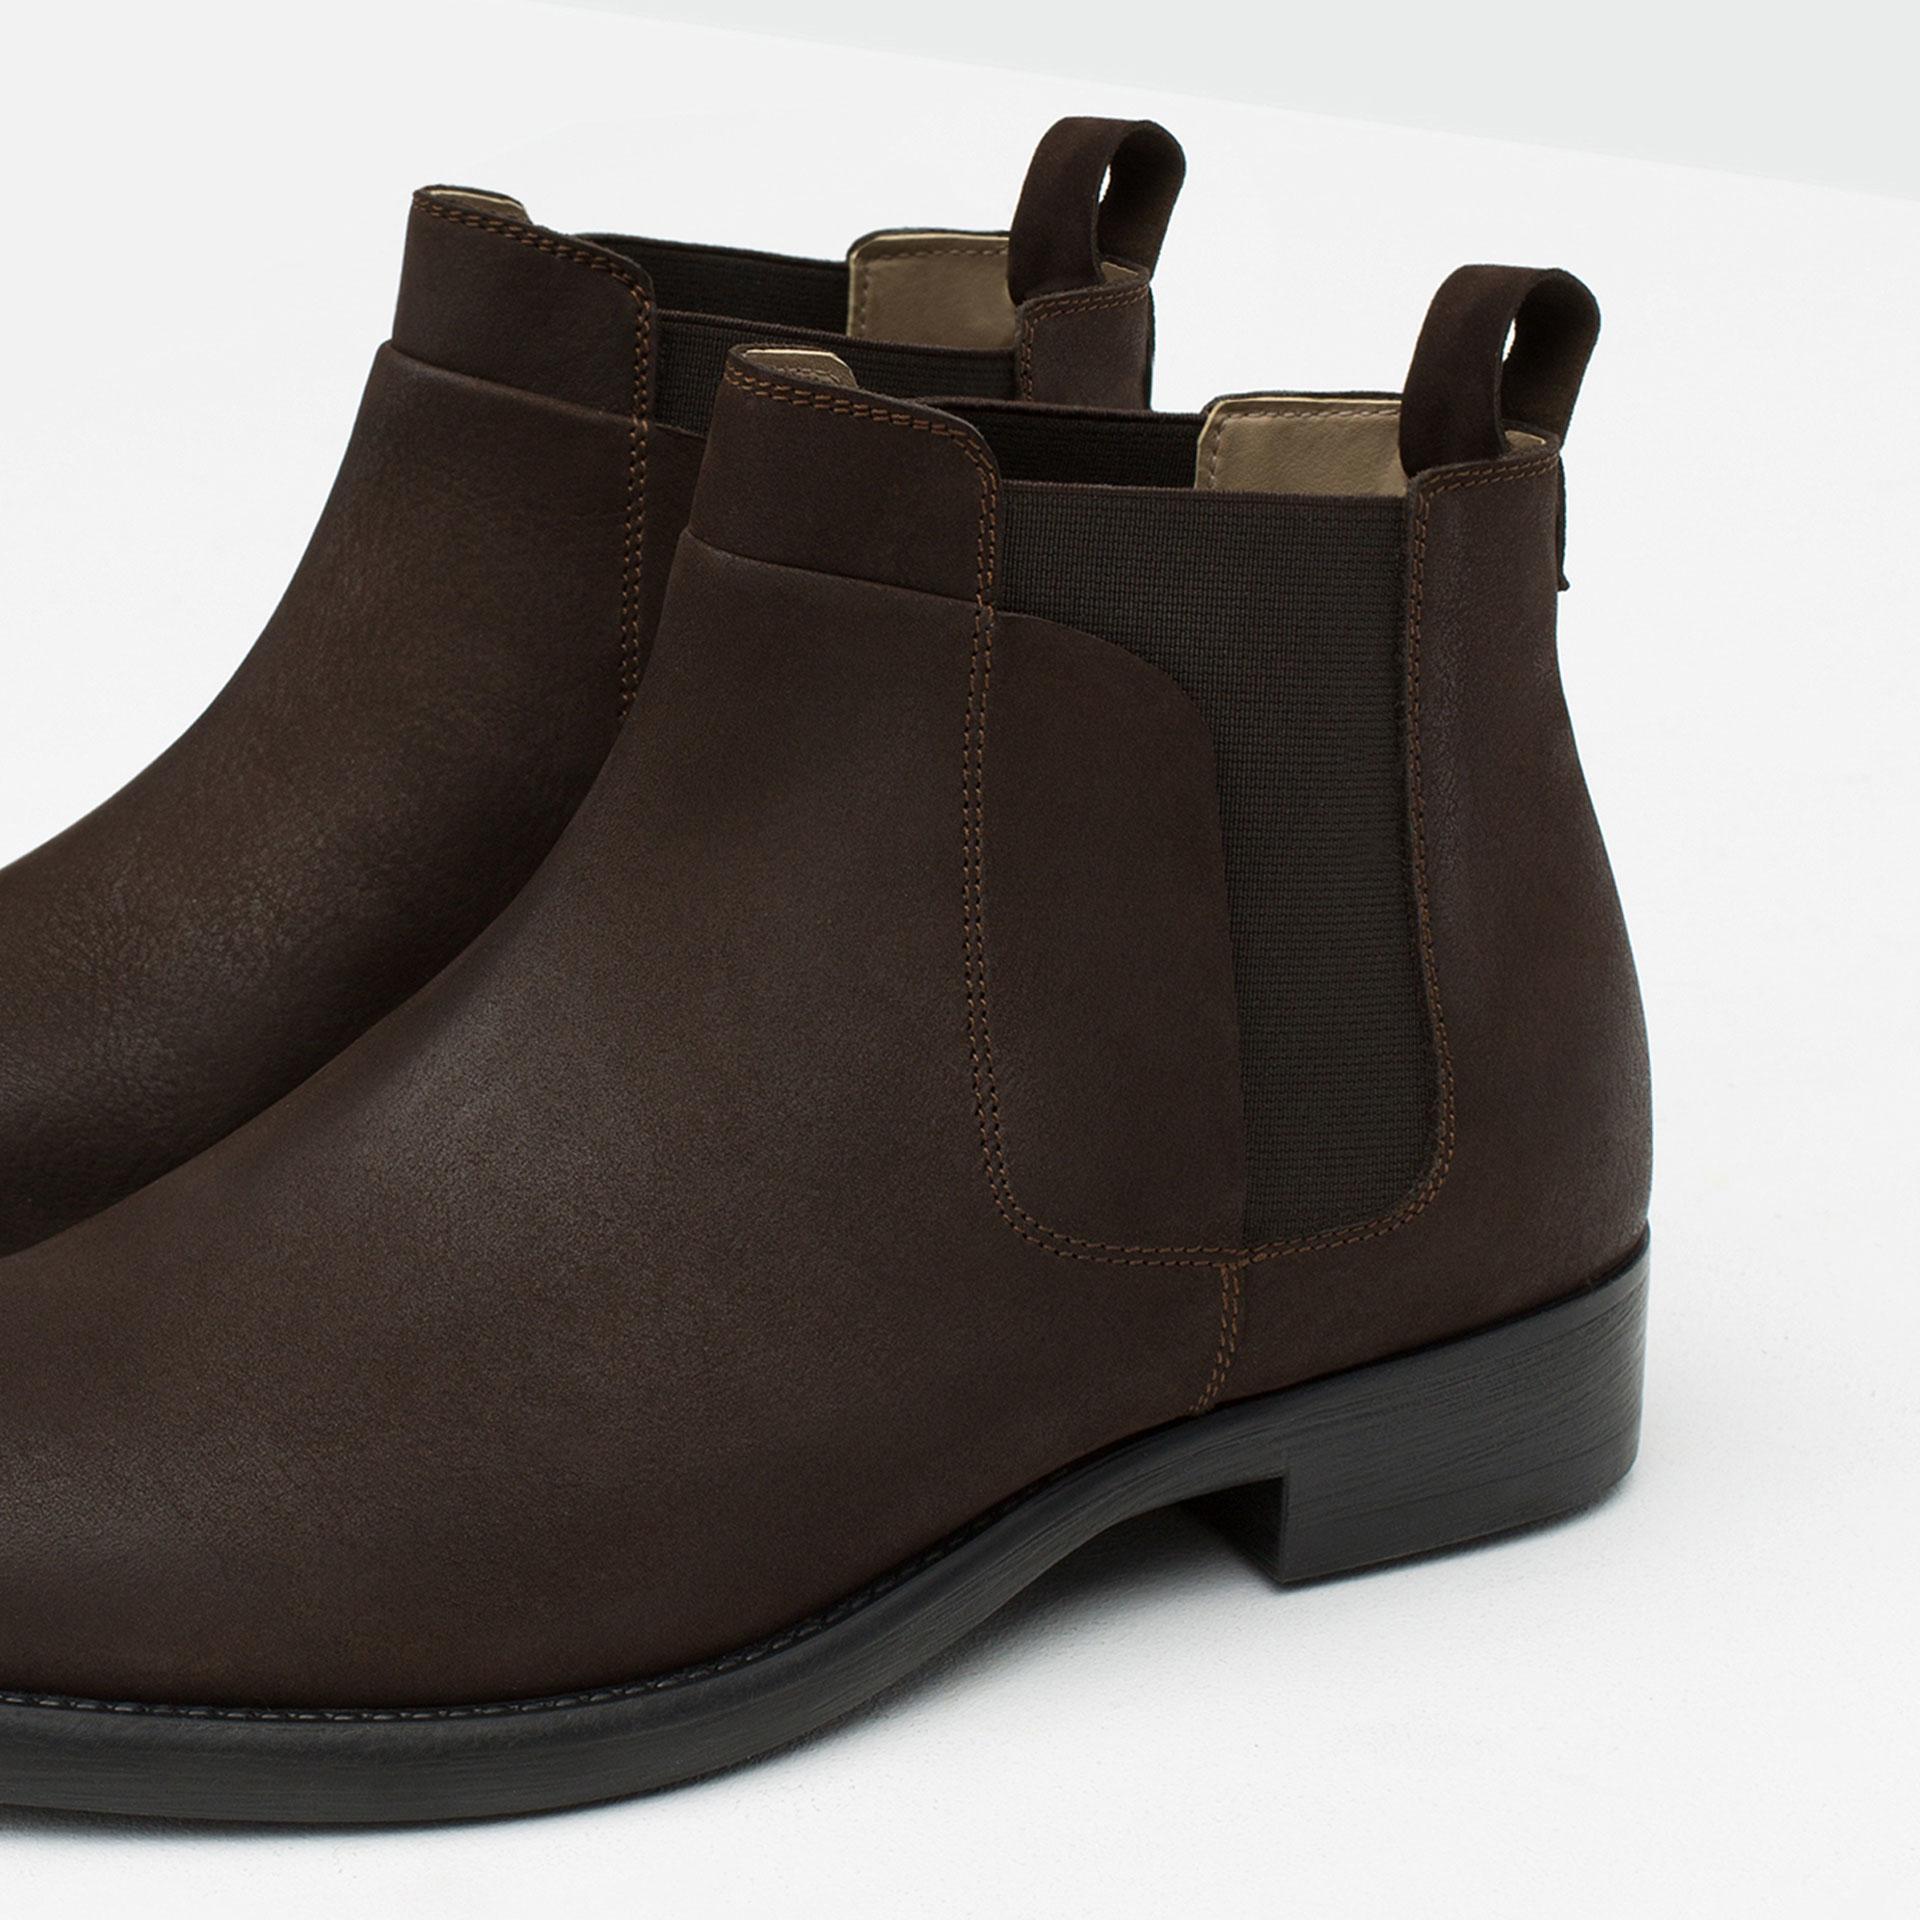 photos officielles e96d5 35d92 Boots Chelsea Chaussures Mode Homme Shopping chelsea Zara fyb76g